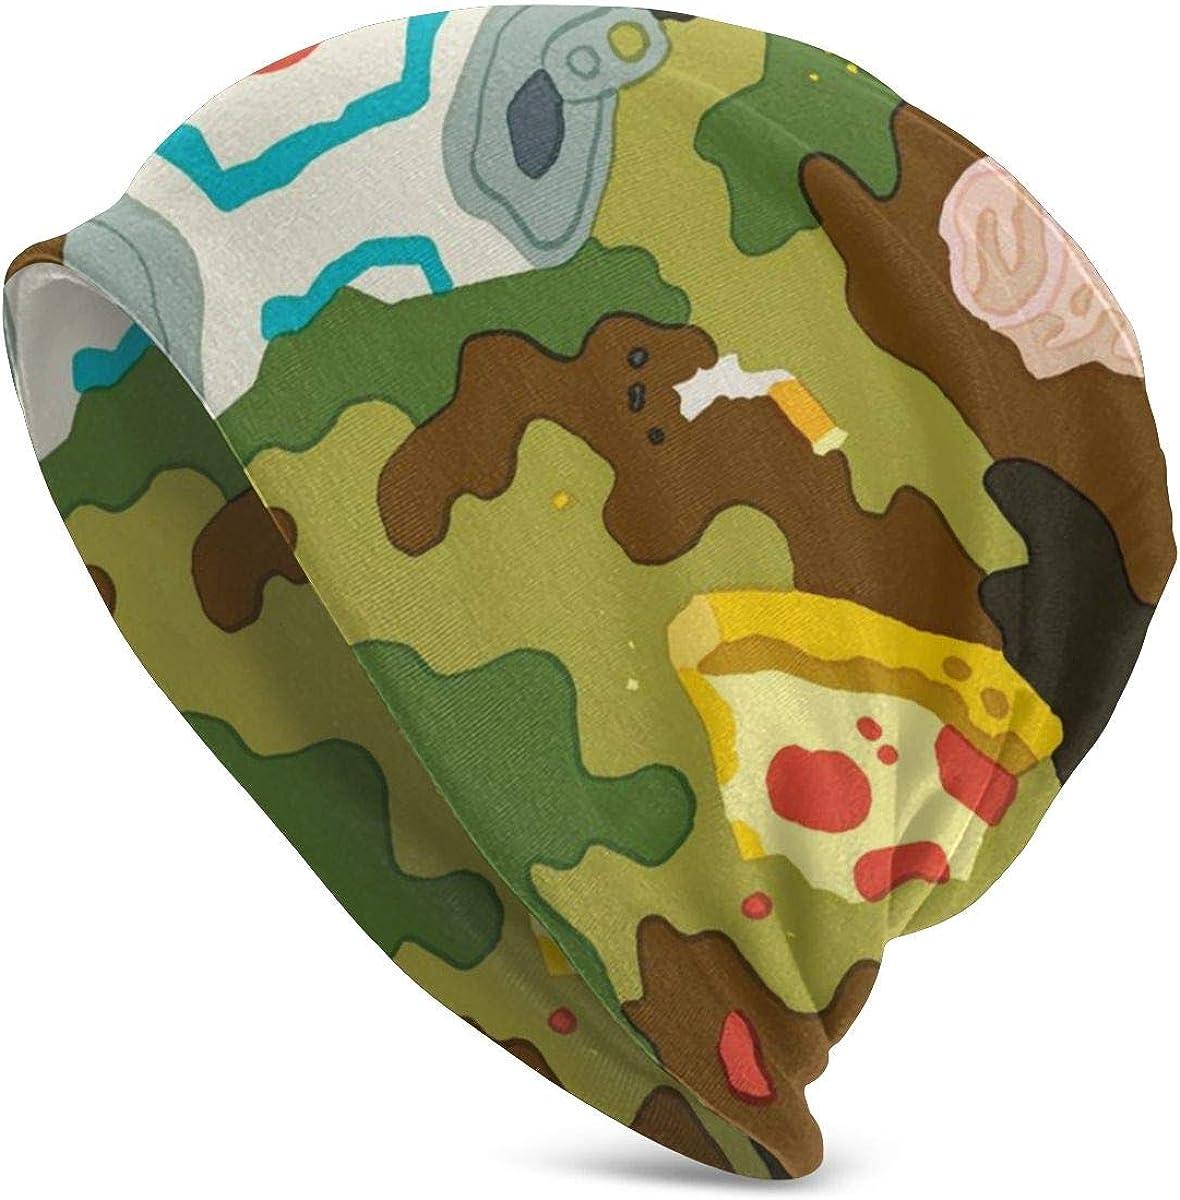 Mens Womens Knit Beanies Hats Pizza Camo Junk Food Adult Warm Winter Caps